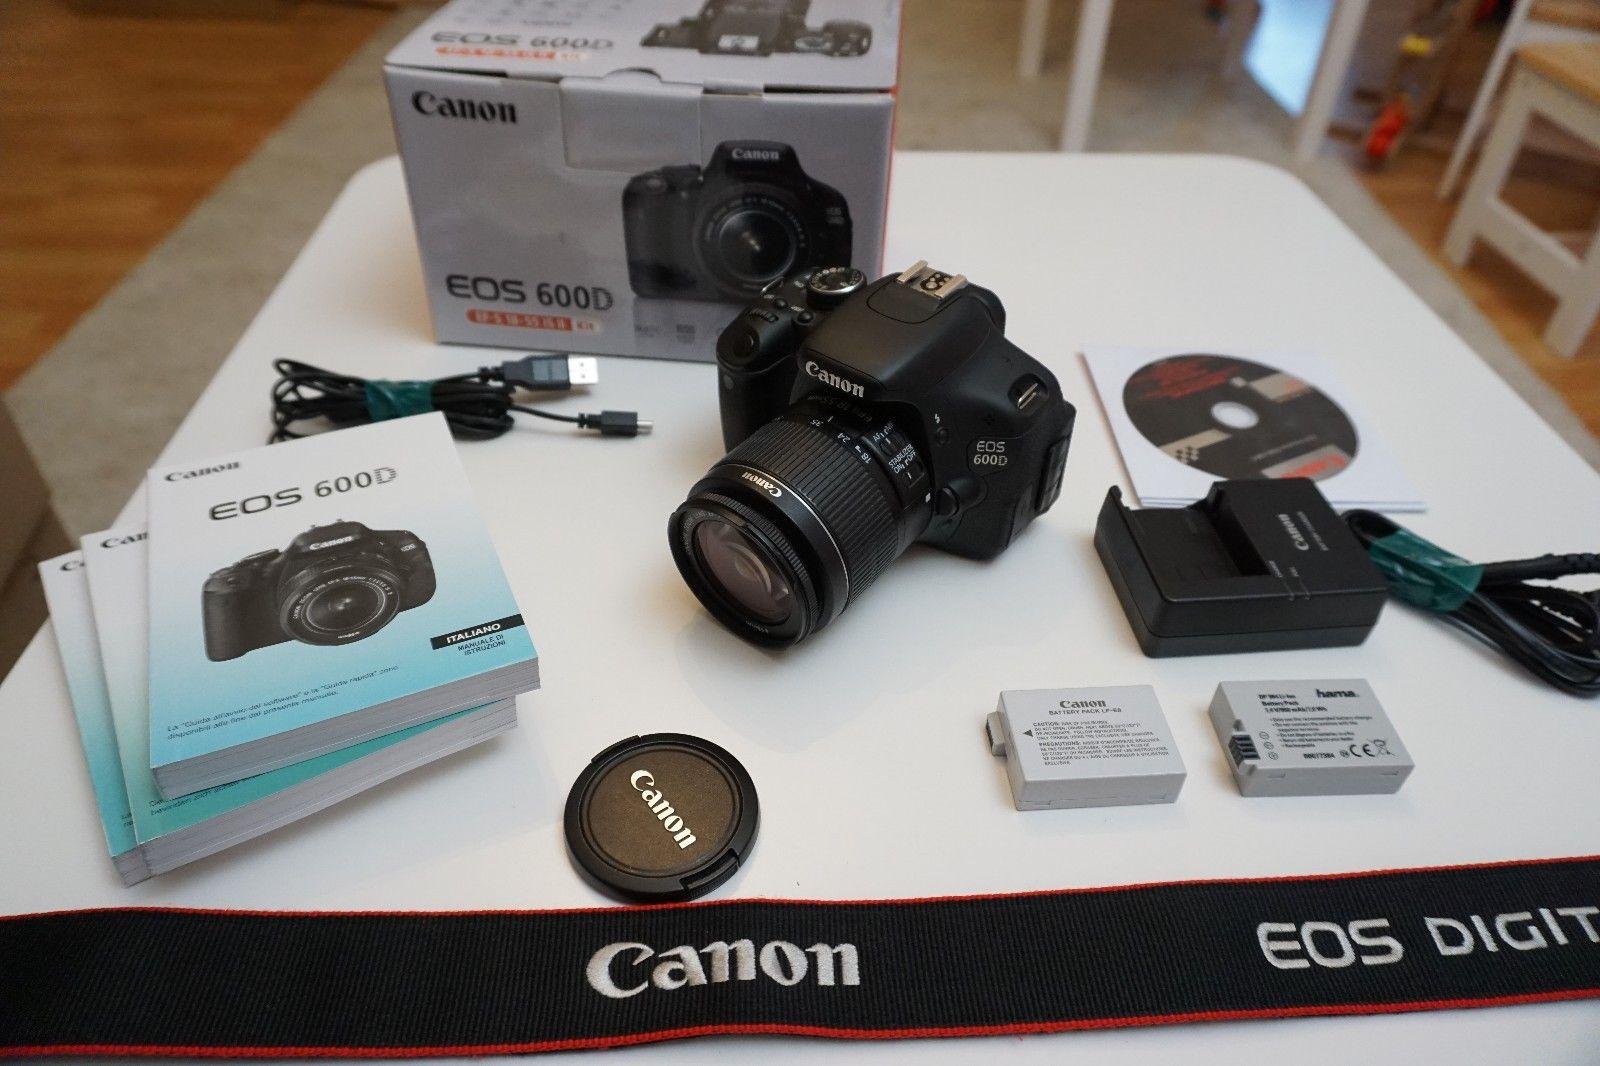 Canon EOS 600D DSLR 18.0 MP SLR-Digitalkamera + Objektiv EF-S 18-55 + OVP